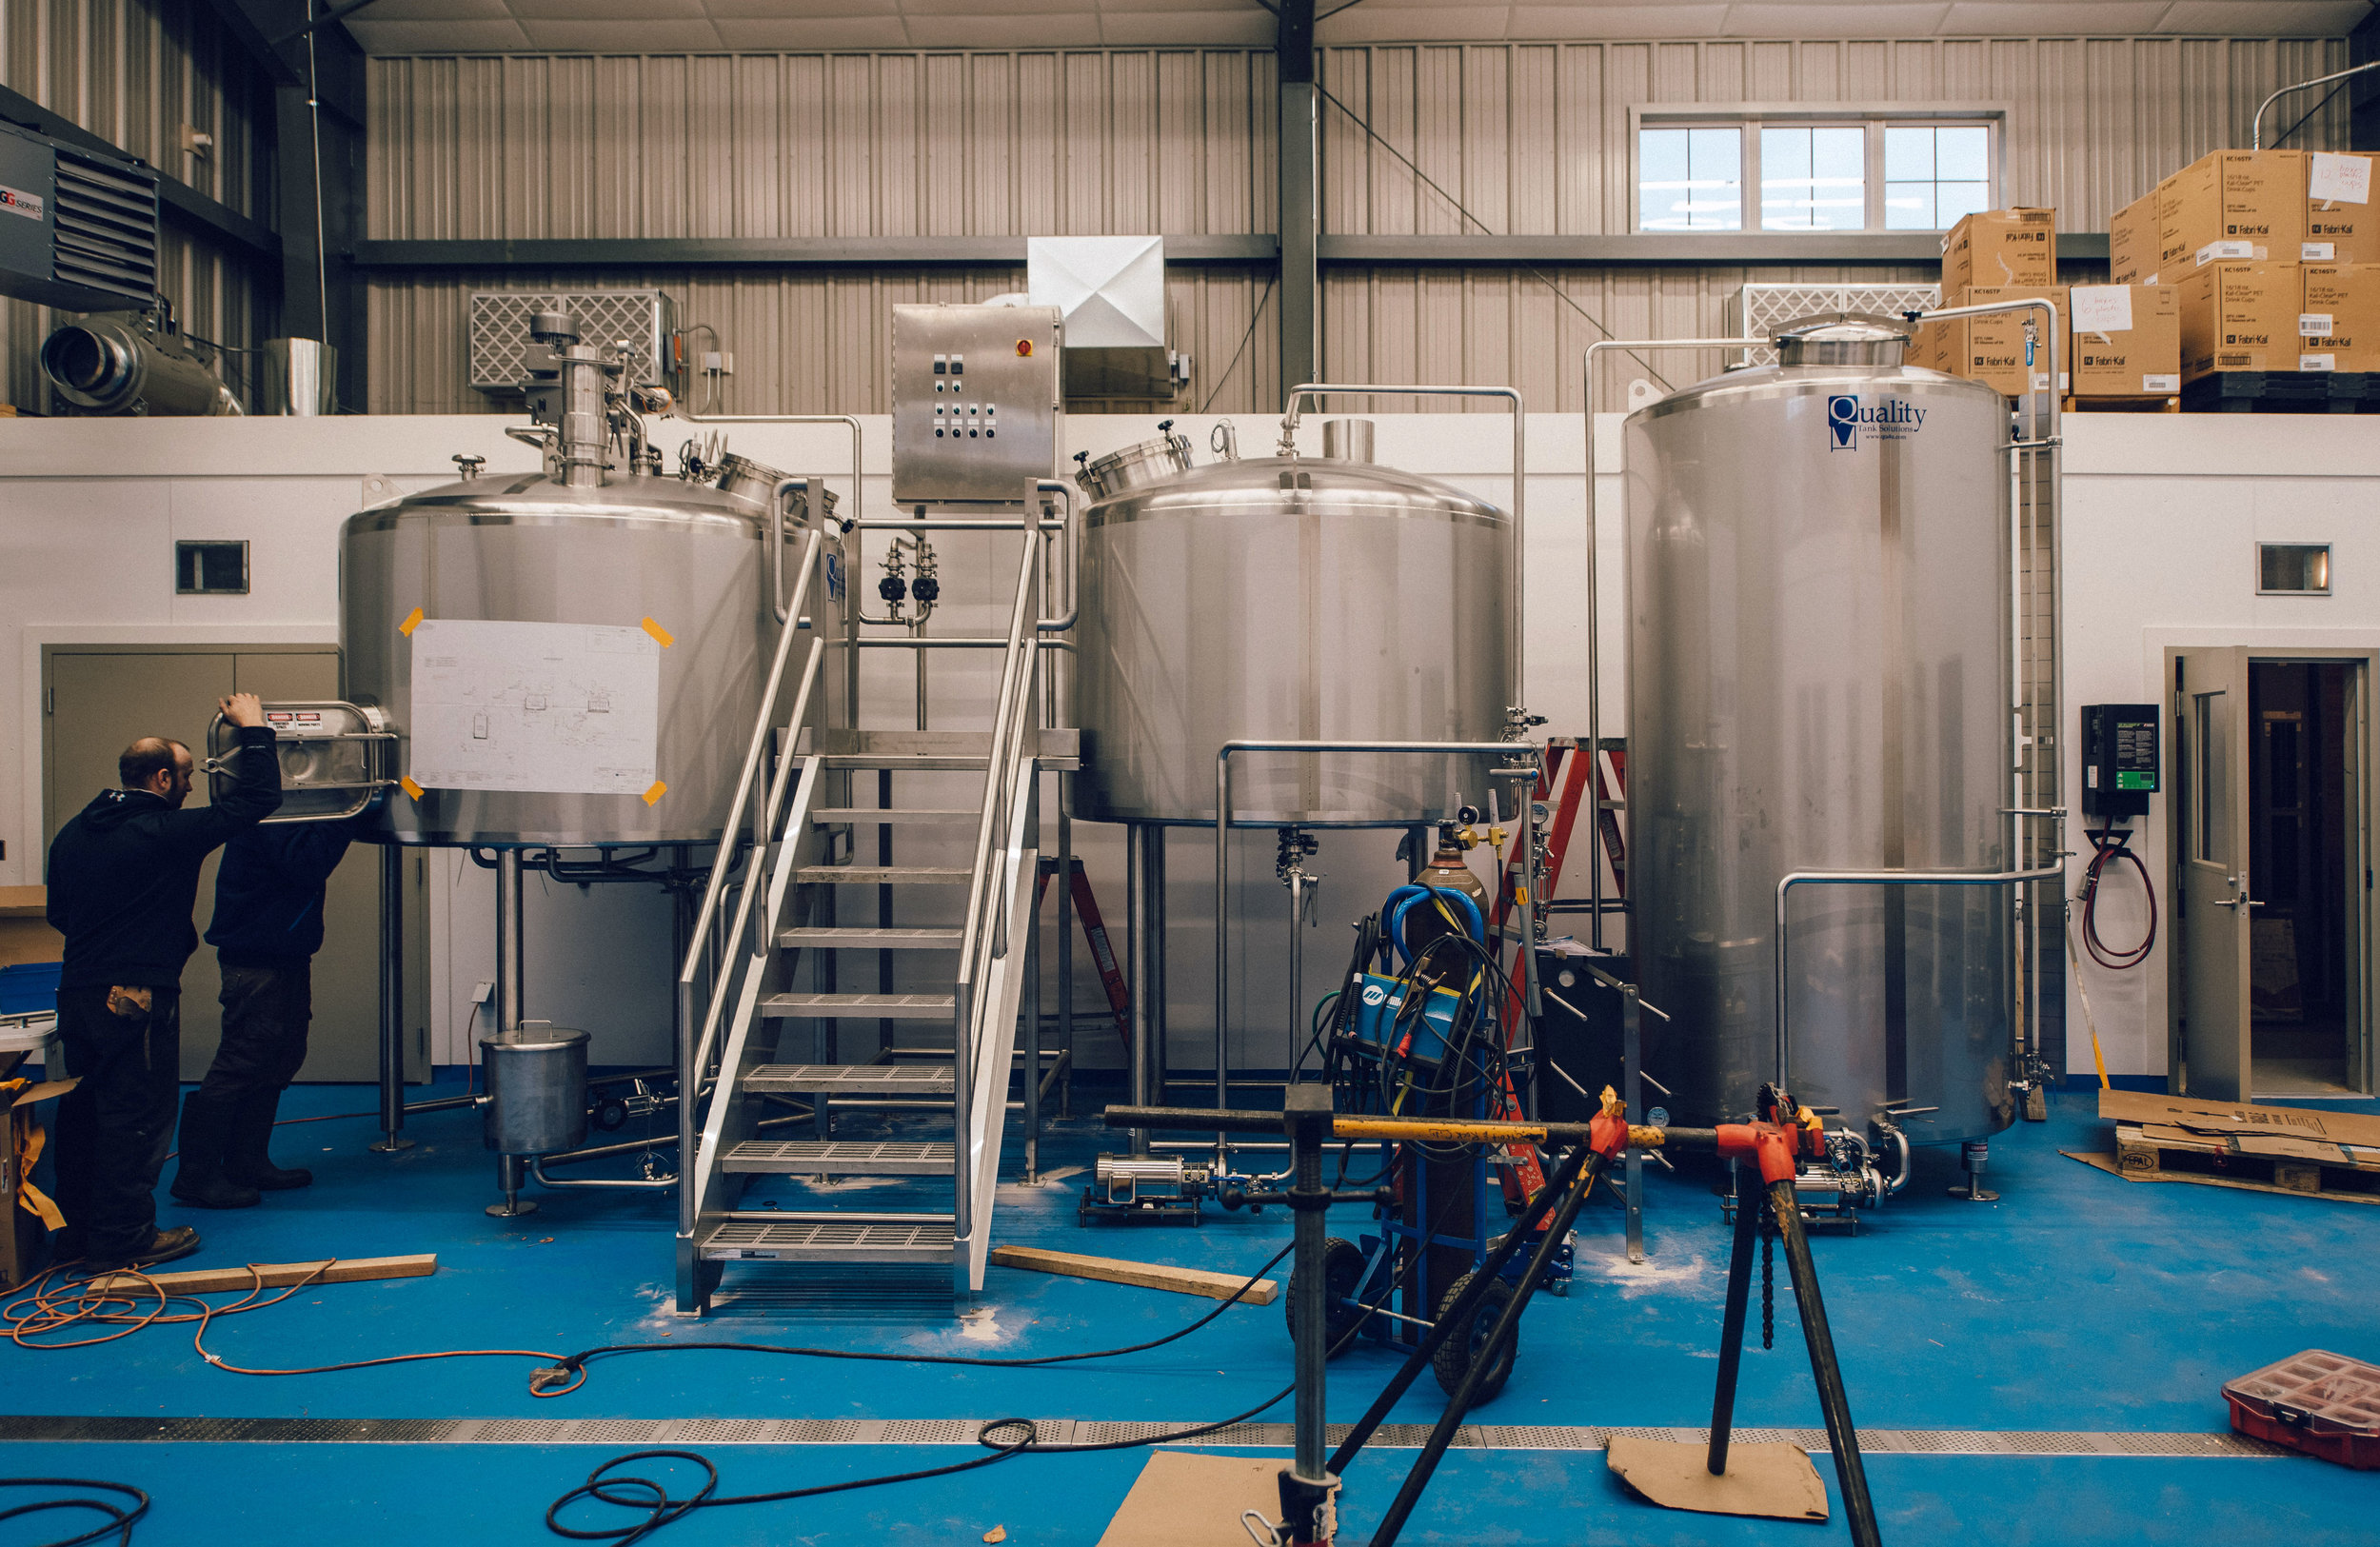 Hacienda-Beer-Co-Door-County-Brewhouse-Install-11.jpg